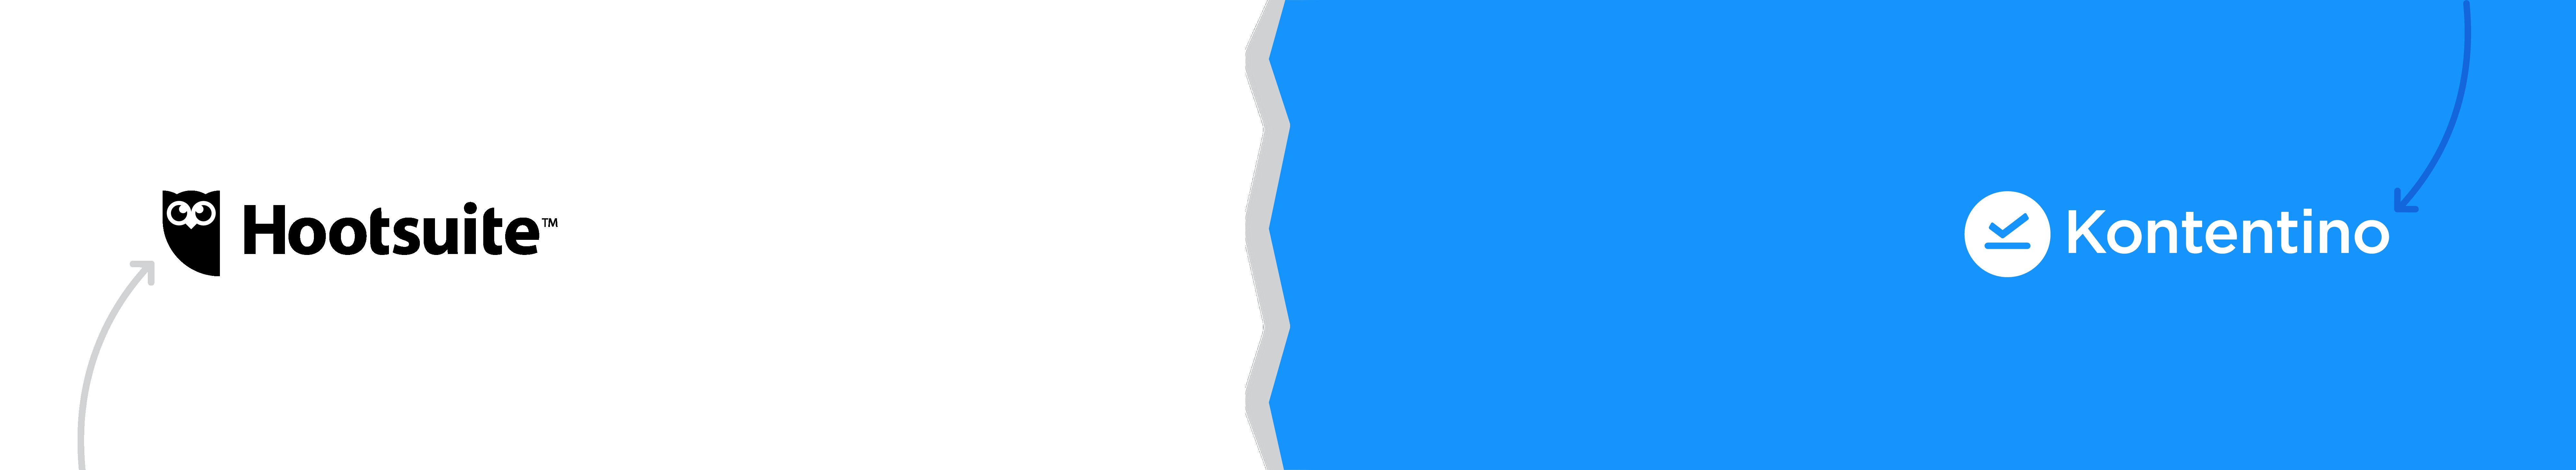 Kontentino vs. Hootsuite